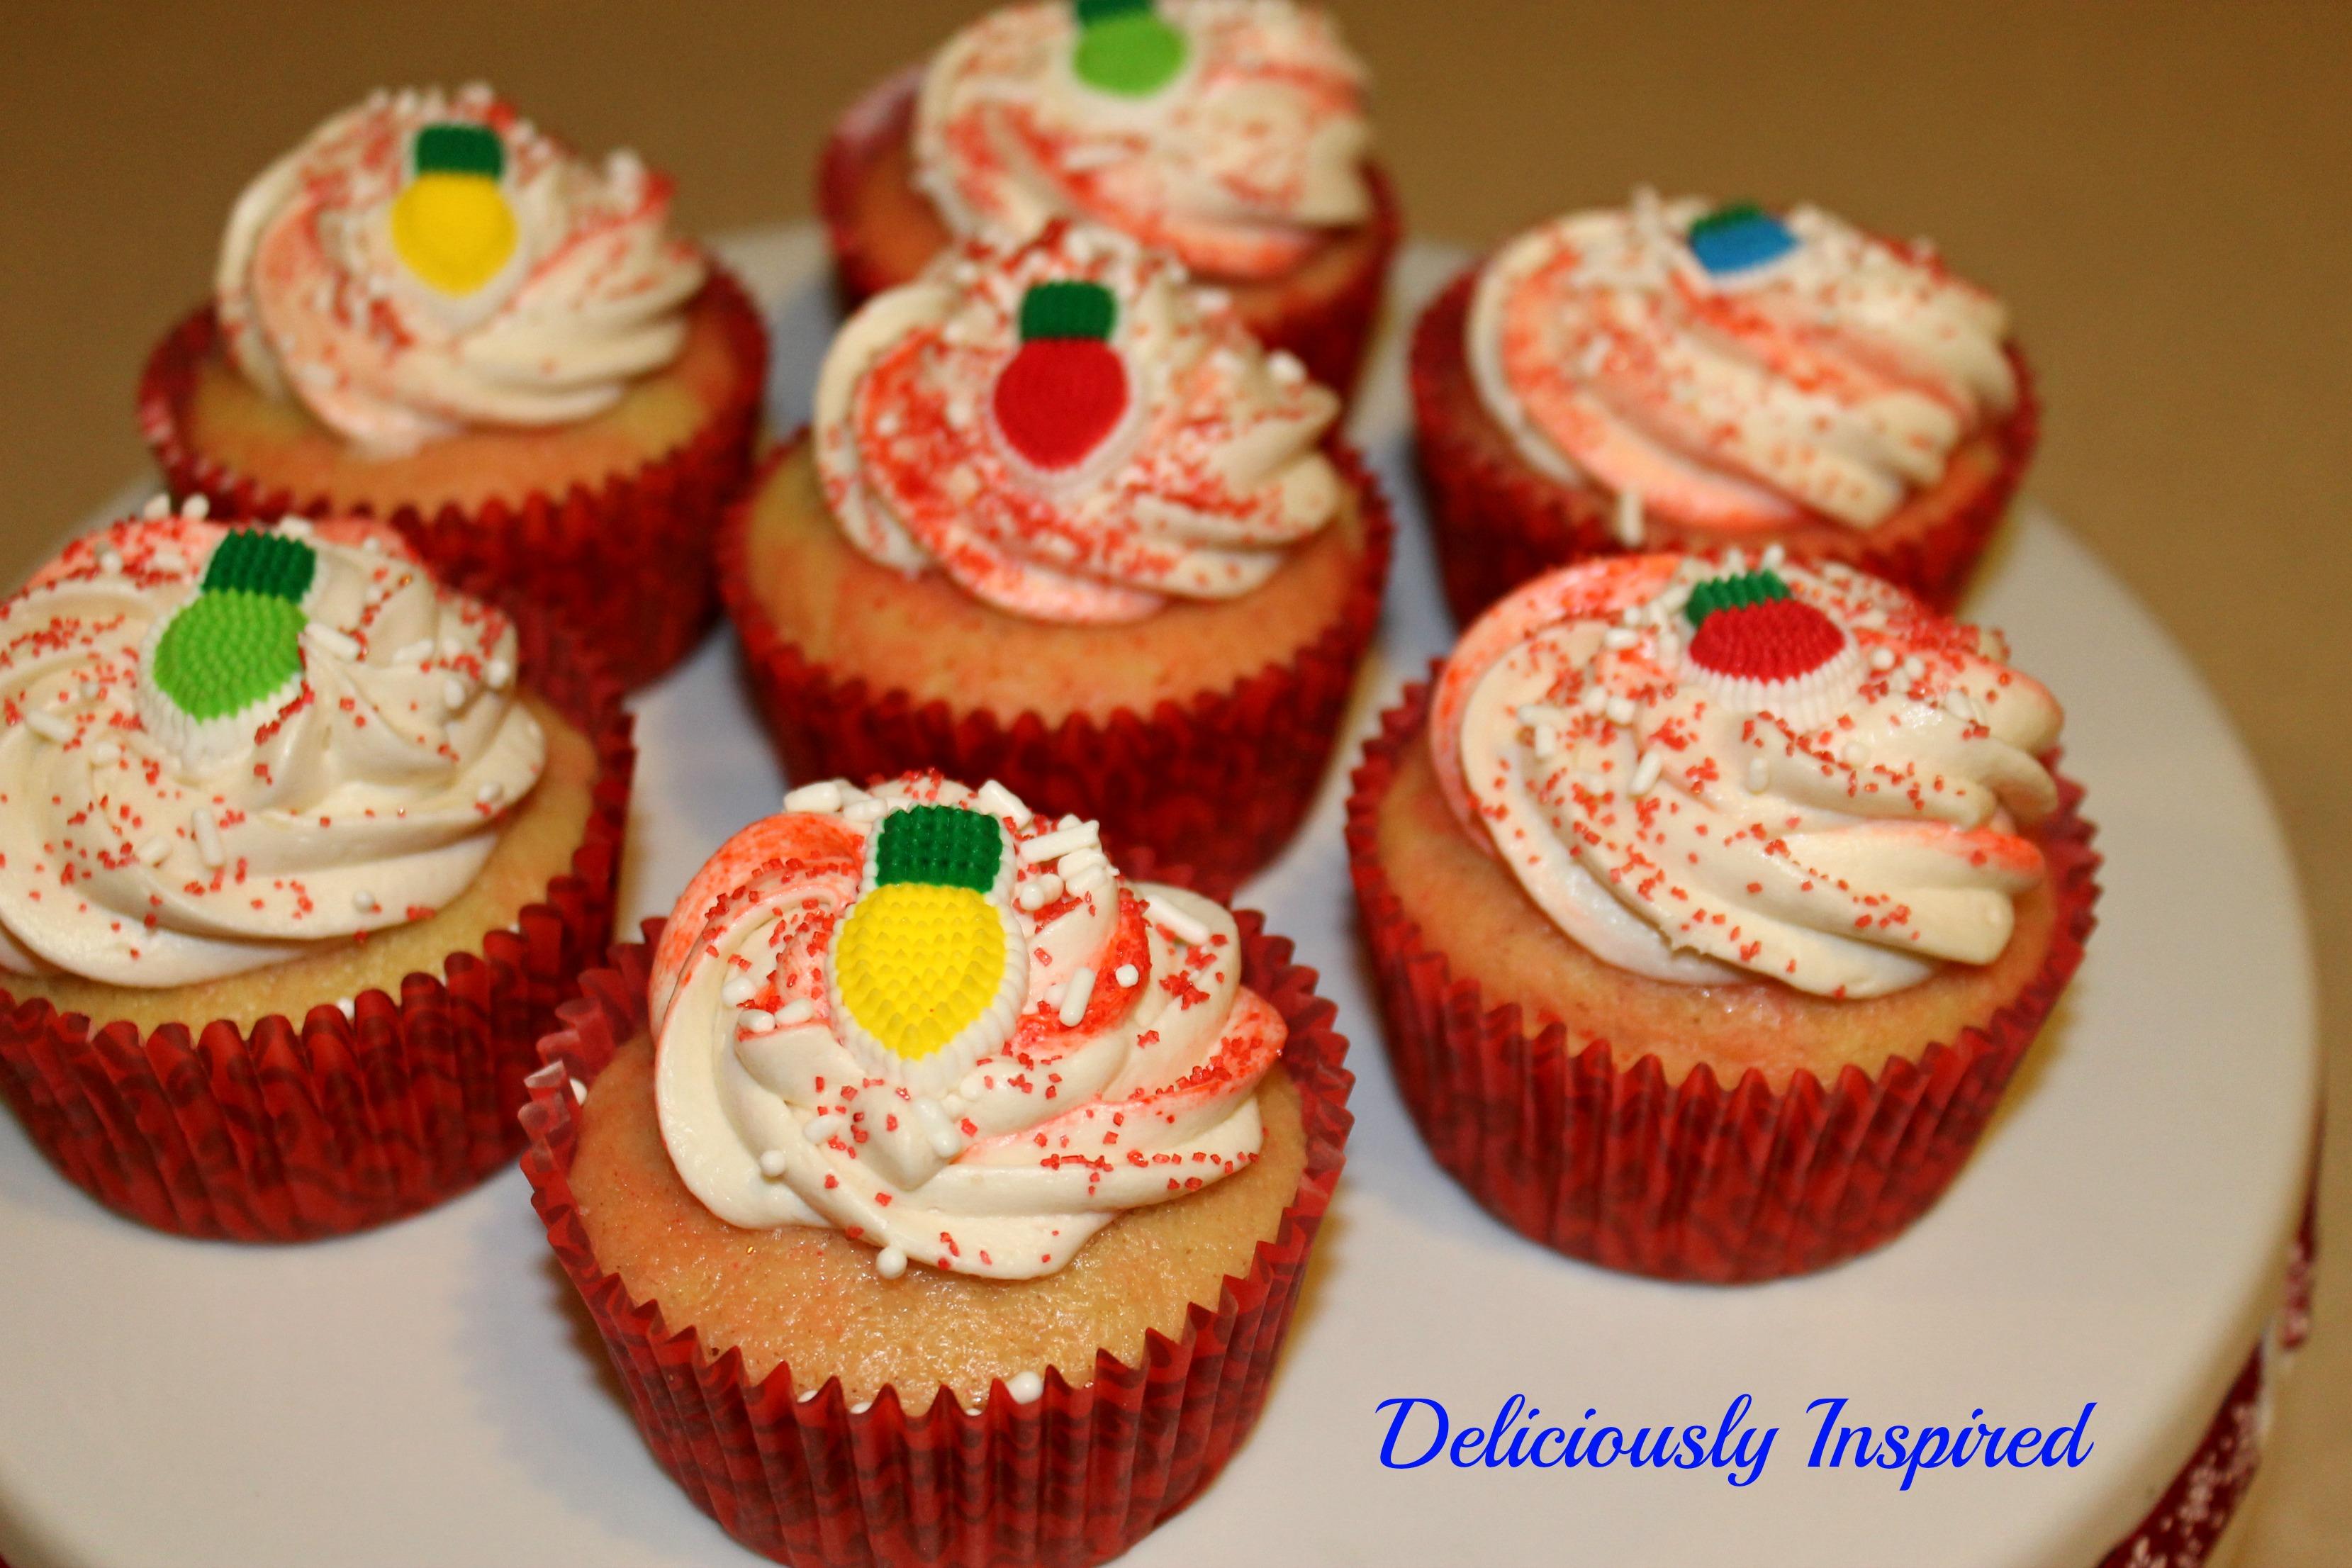 Vanilla Swirl Cupcakes with Cream Cheese Frosting - pic branding